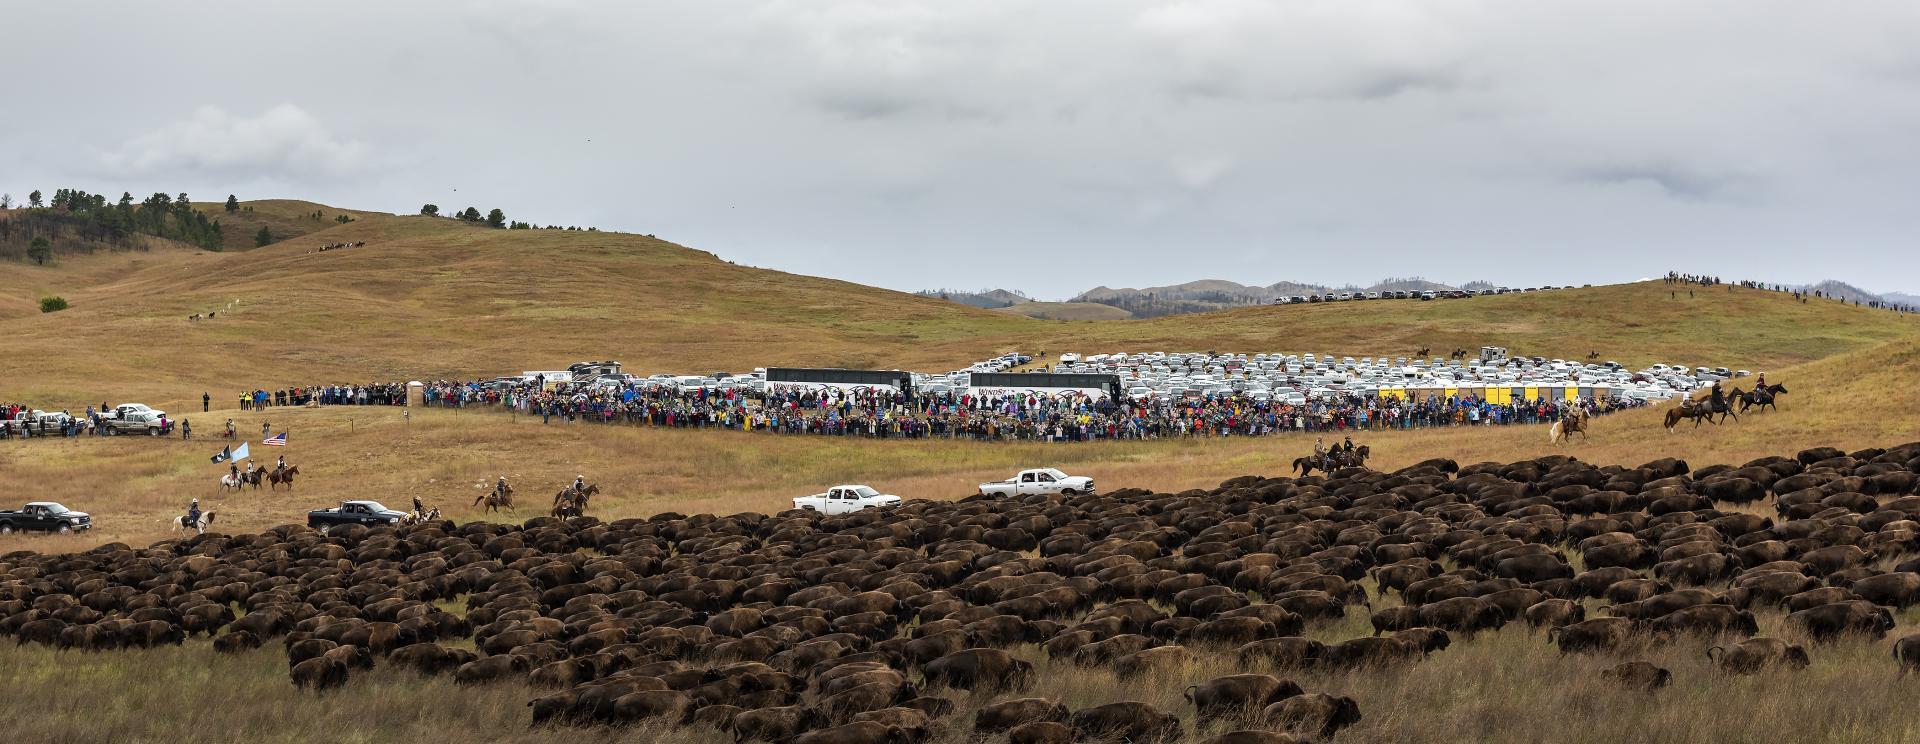 Everything You Need for an Incredible Buffalo Roundup